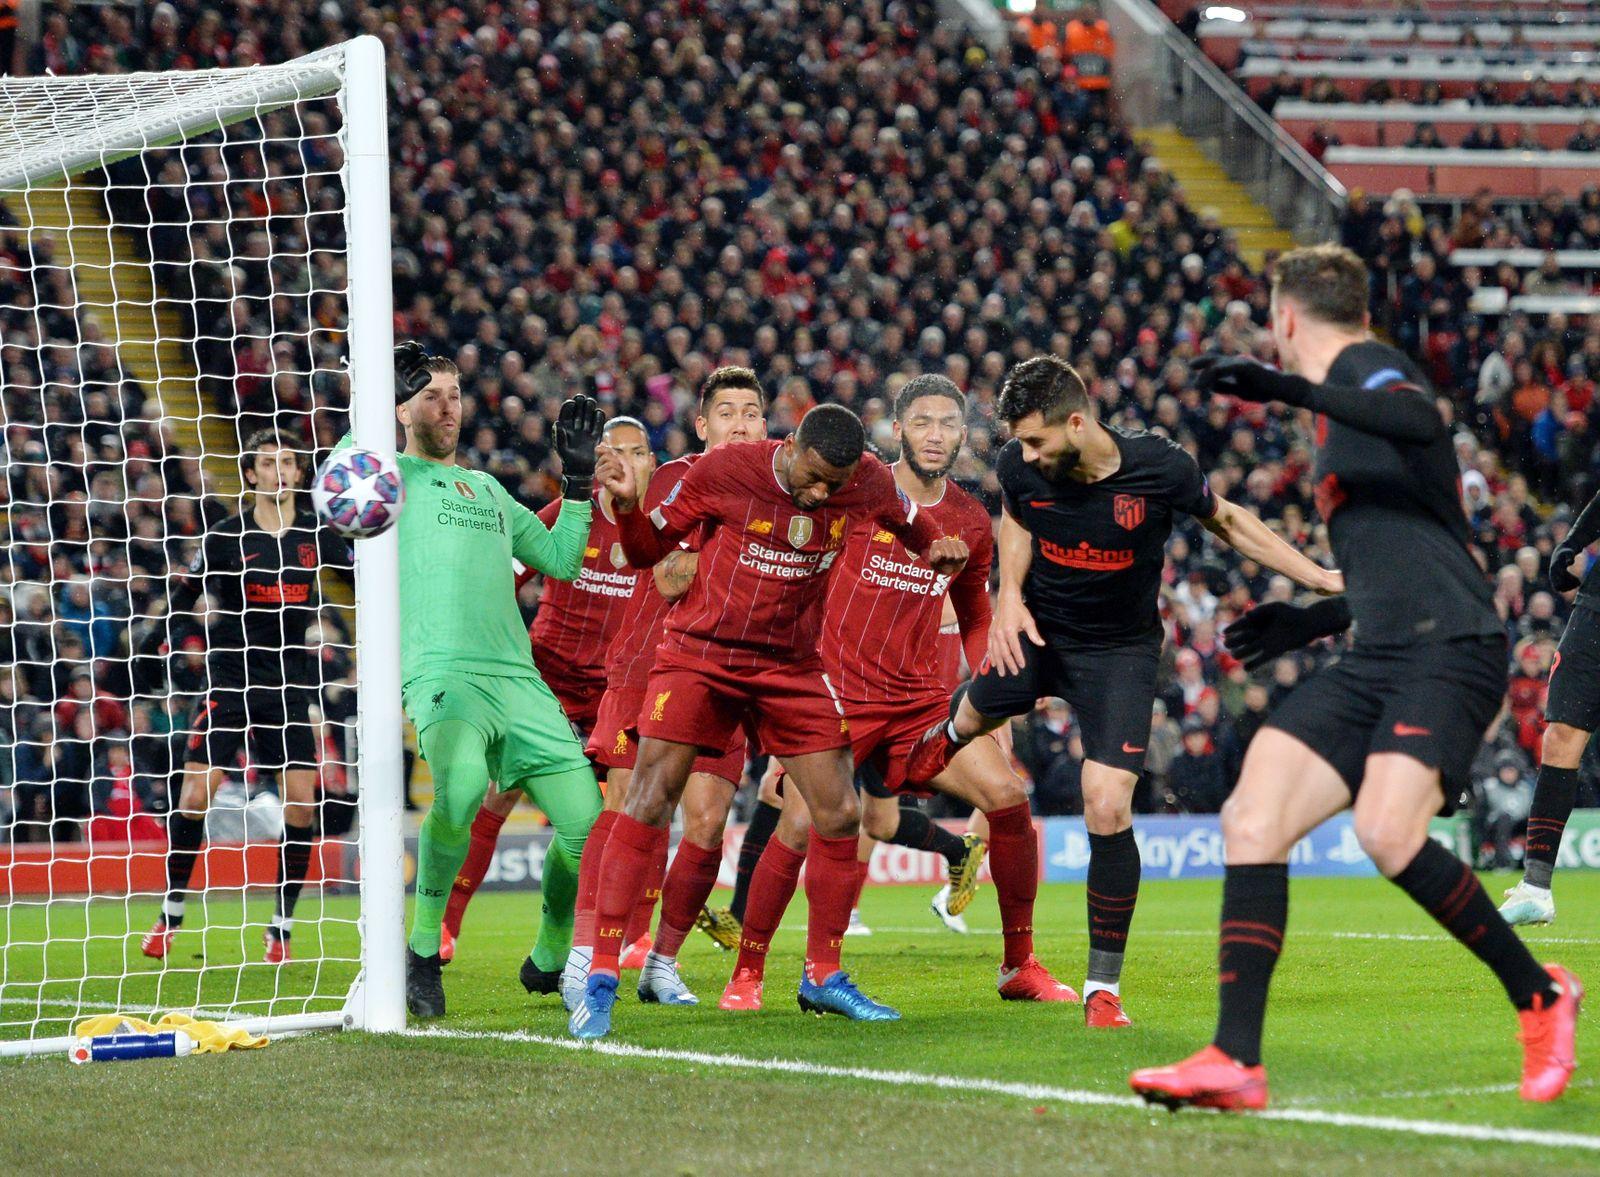 Liverpool FC vs Atletico Madrid, United Kingdom - 11 Mar 2020